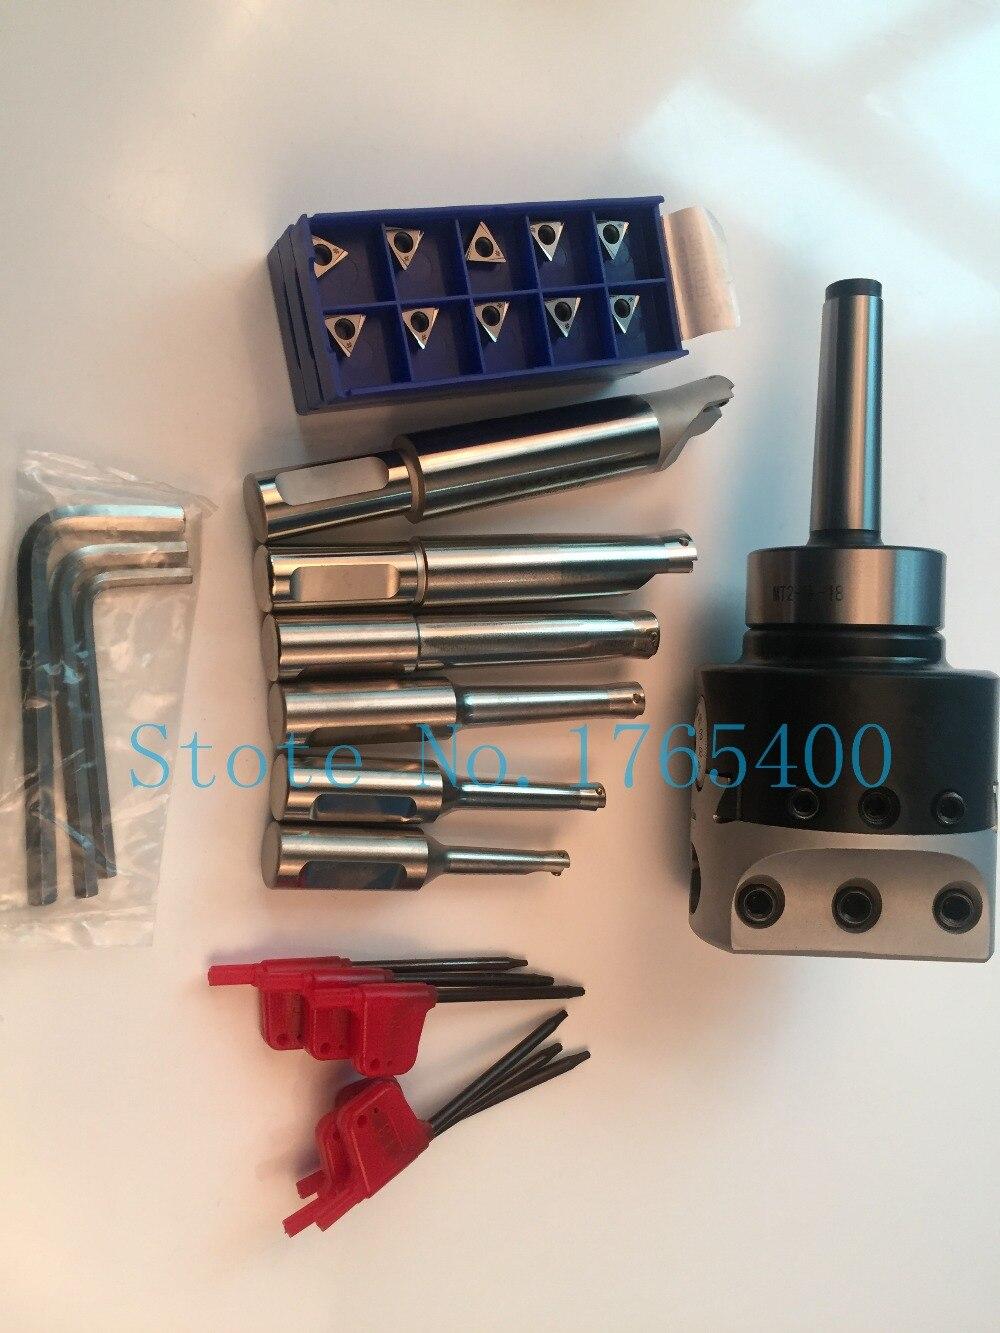 New MT2 M10 & F1 -18  75mm boring head and shank 18mm 6pcs boring bar and 30pcs carbide inserts